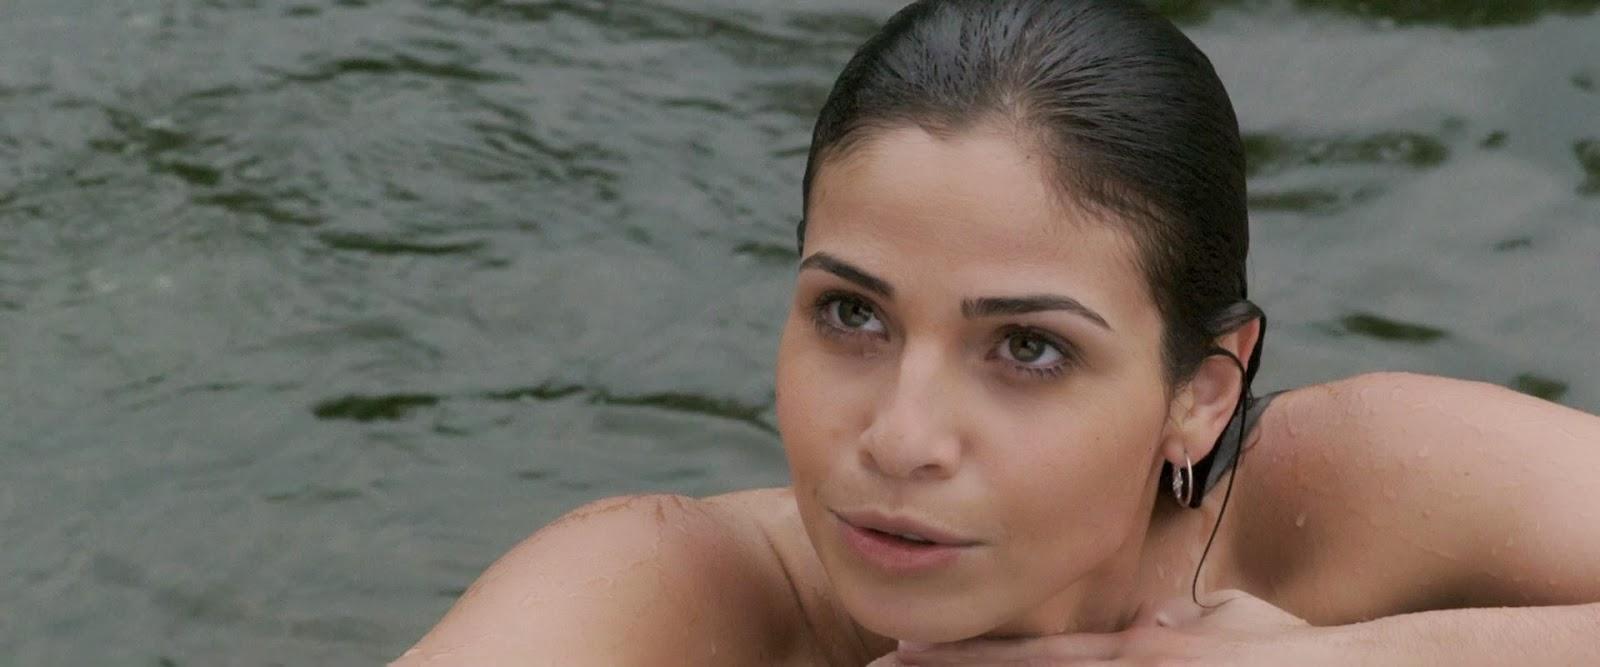 Ana Ayora Nude nuce - nude celebs: ana ayora nude hd